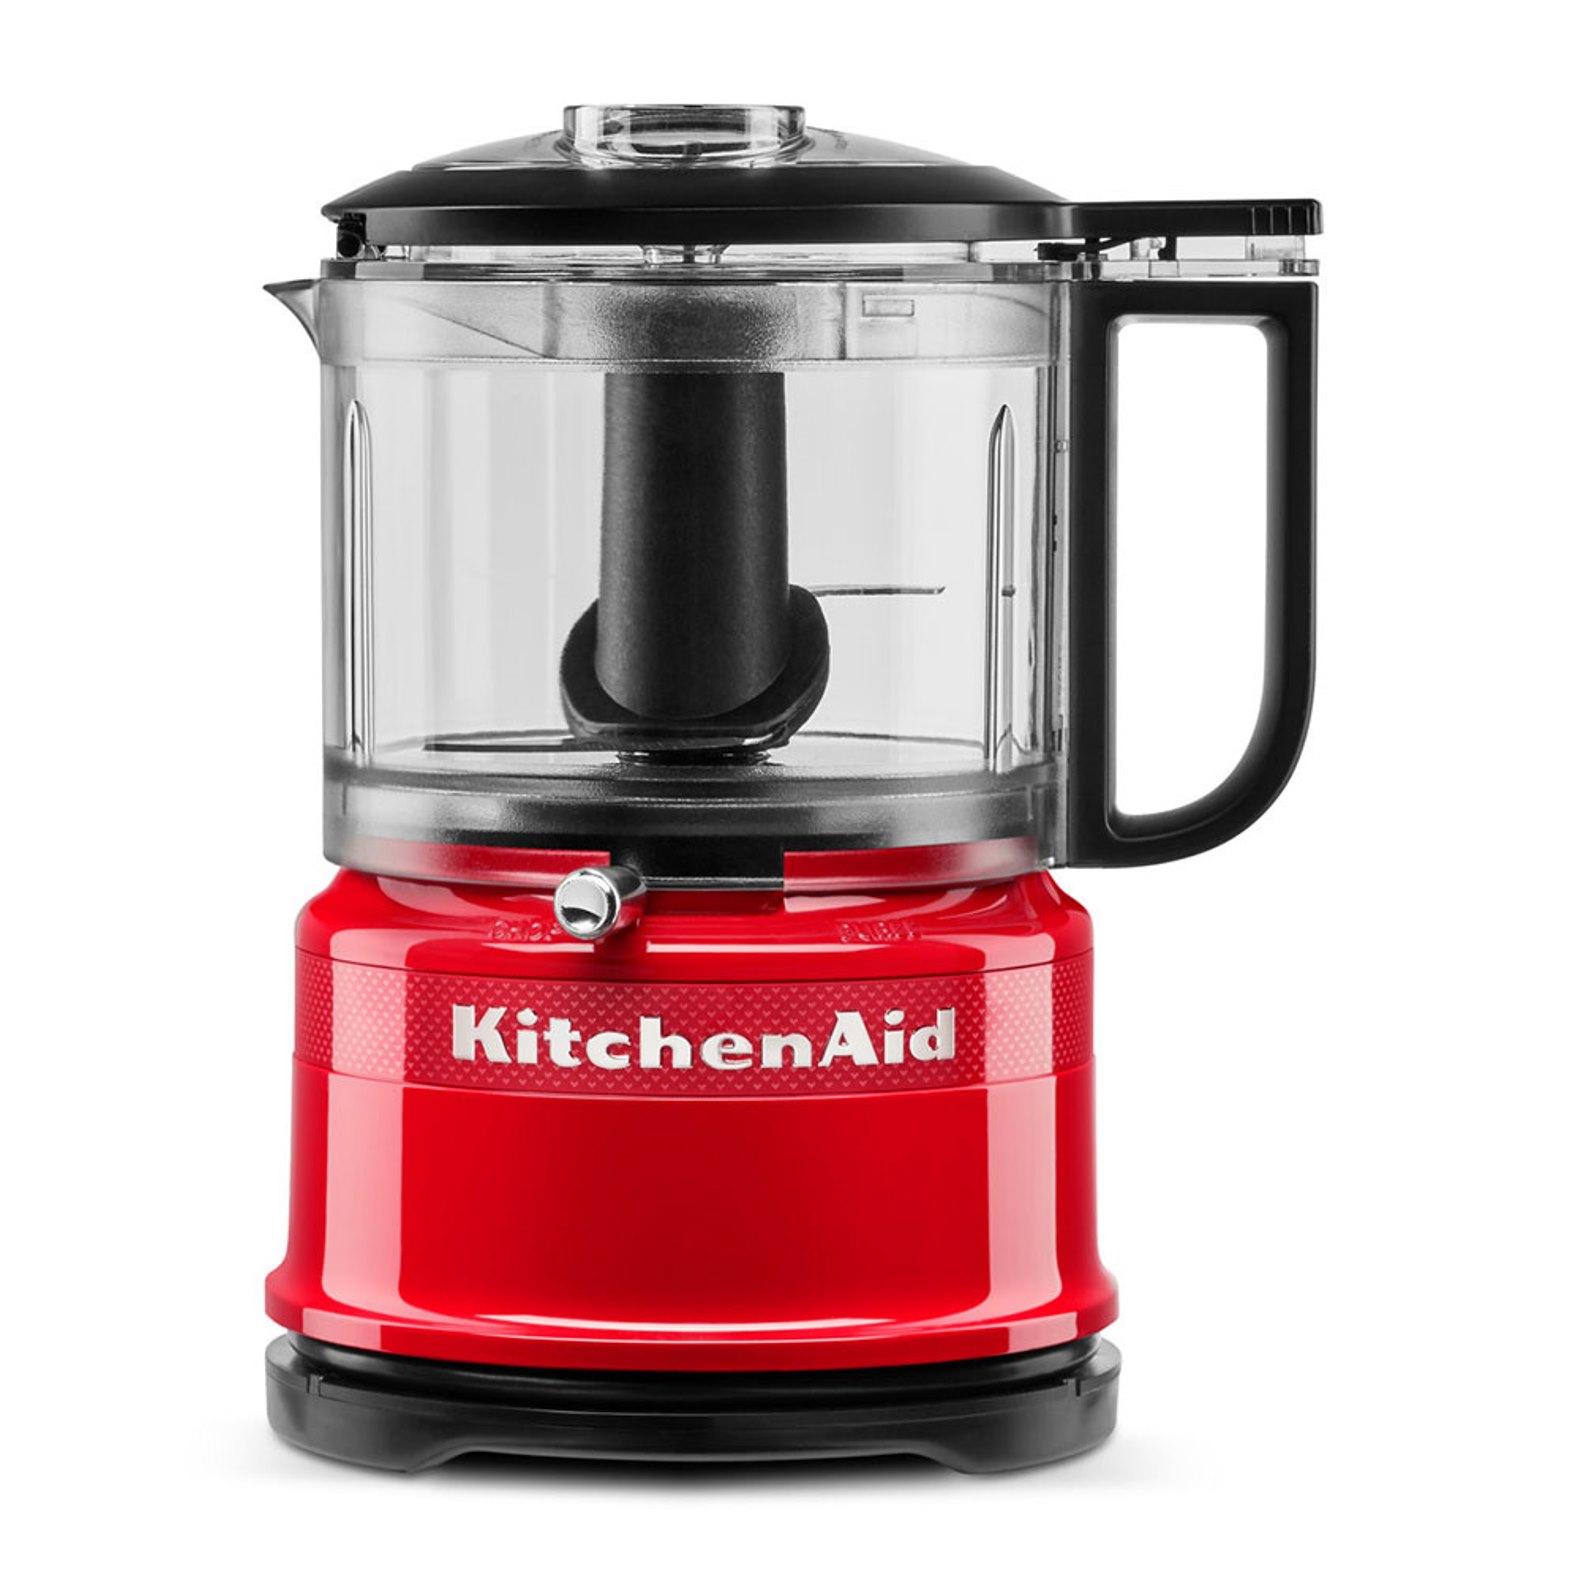 Онлайн каталог PROMENU: Измельчитель KitchenAid Queen of Hearts, объем 0,83 л, 22,2x17,8x14,3 см, чувственный красный KitchenAid 5KFC3516HESD